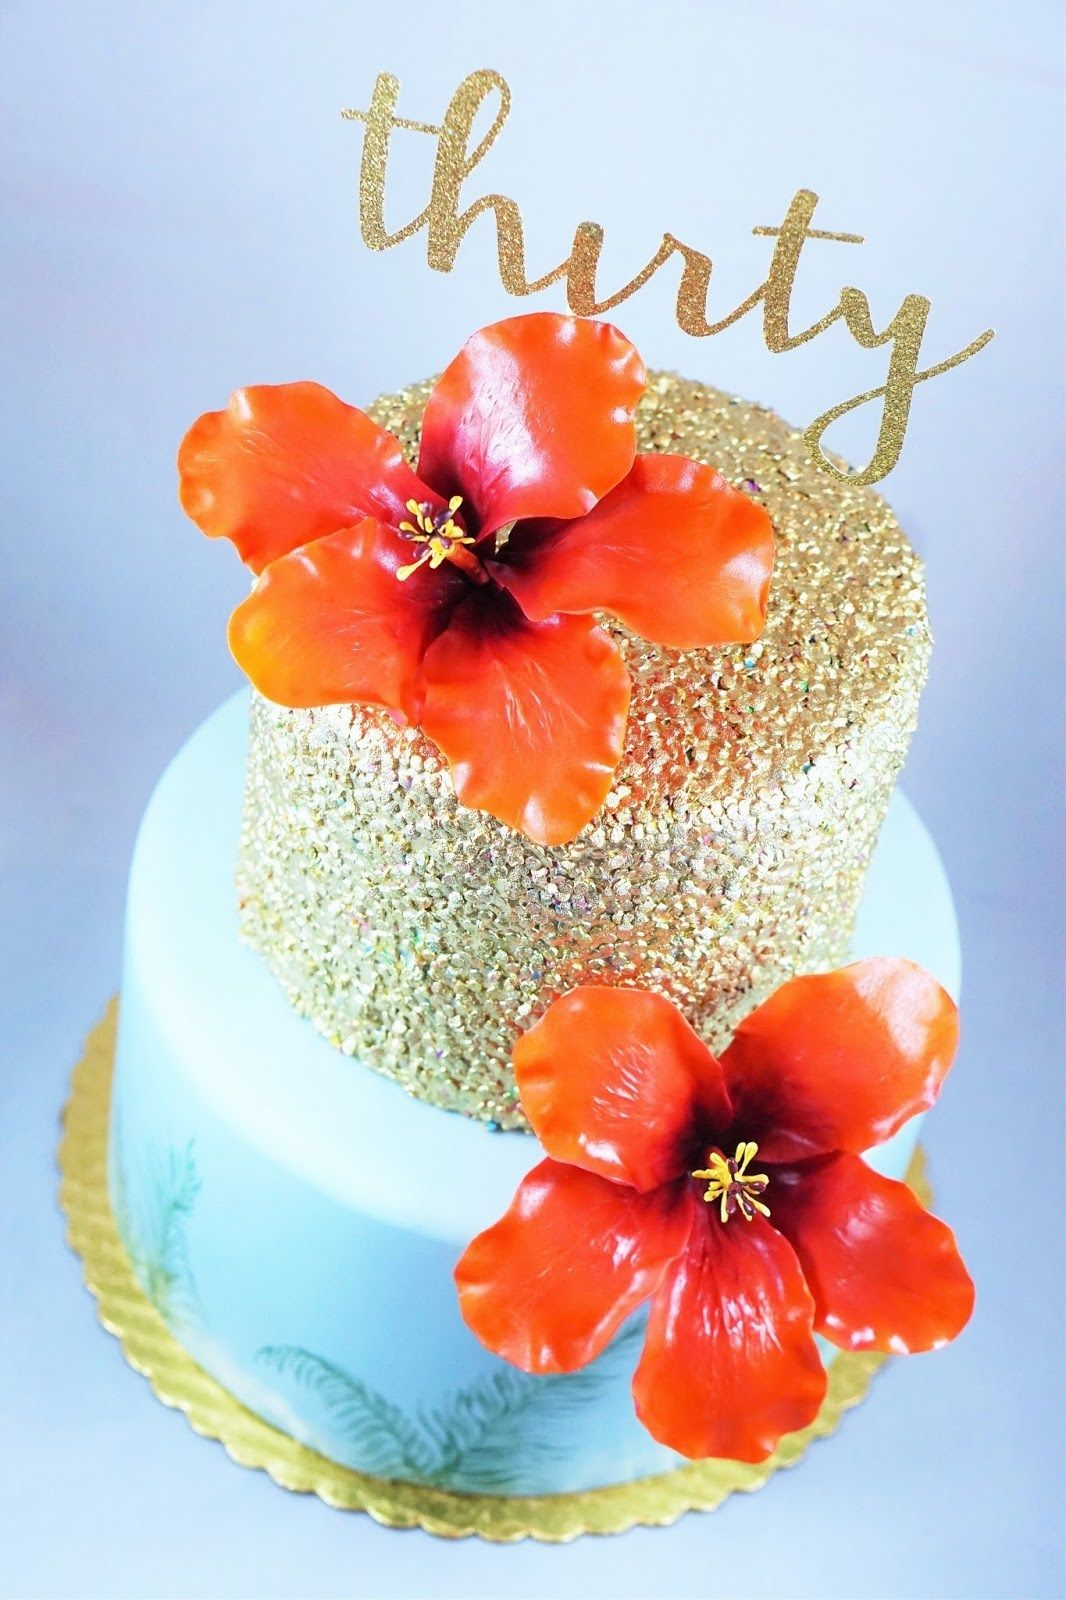 hawaiian birthday cake for man